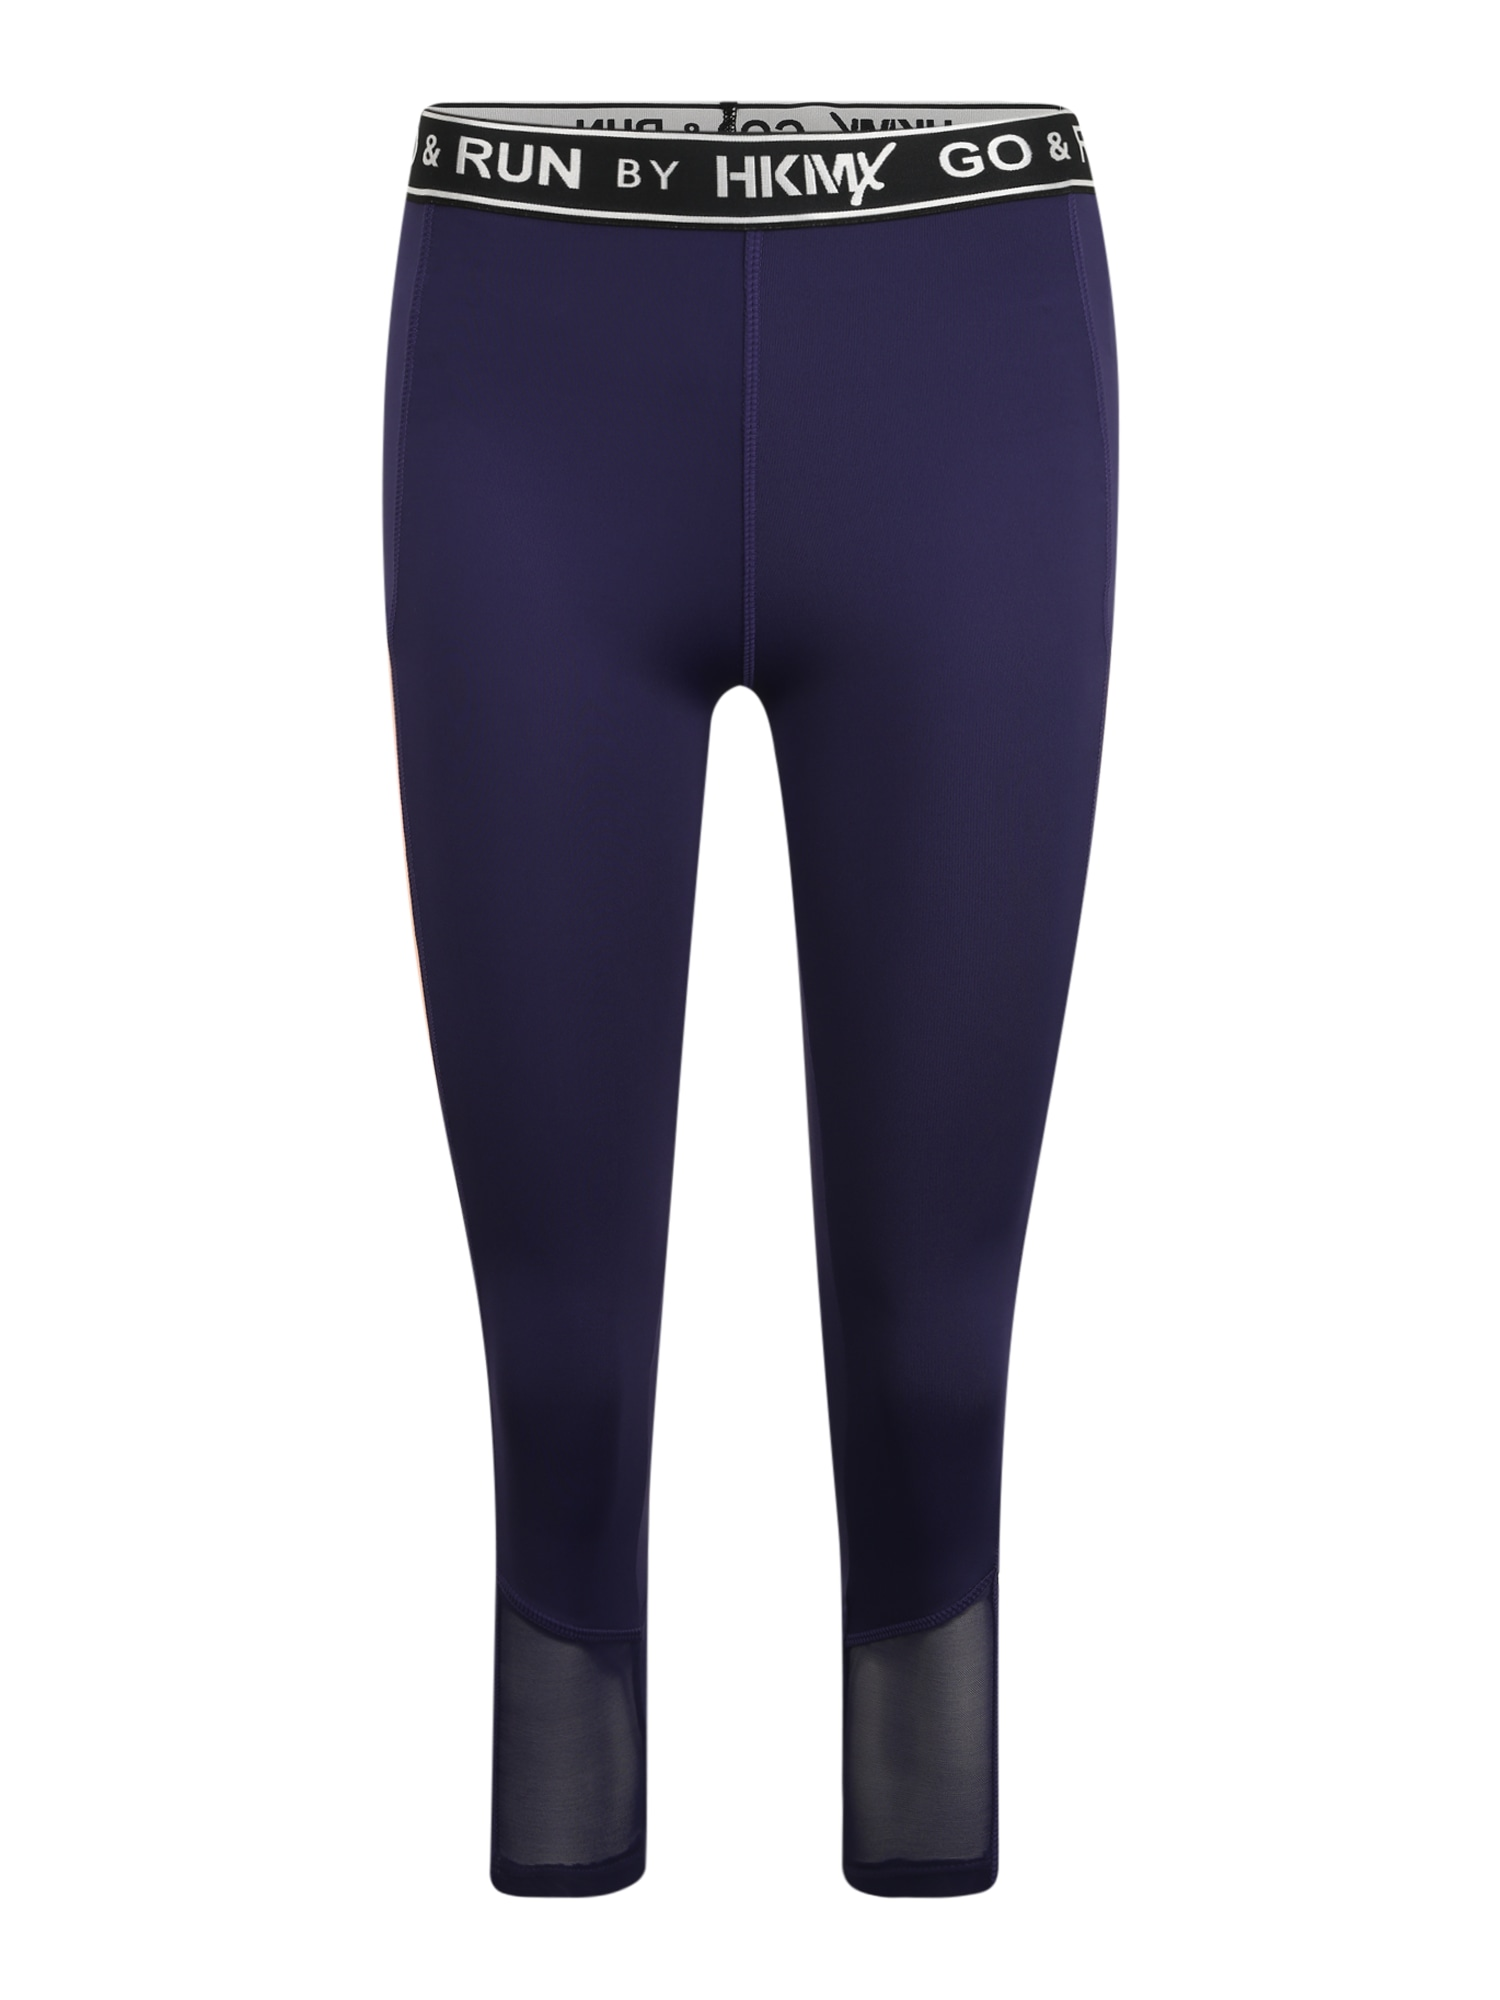 HKMX Športové nohavice  námornícka modrá / biela / čierna / staroružová